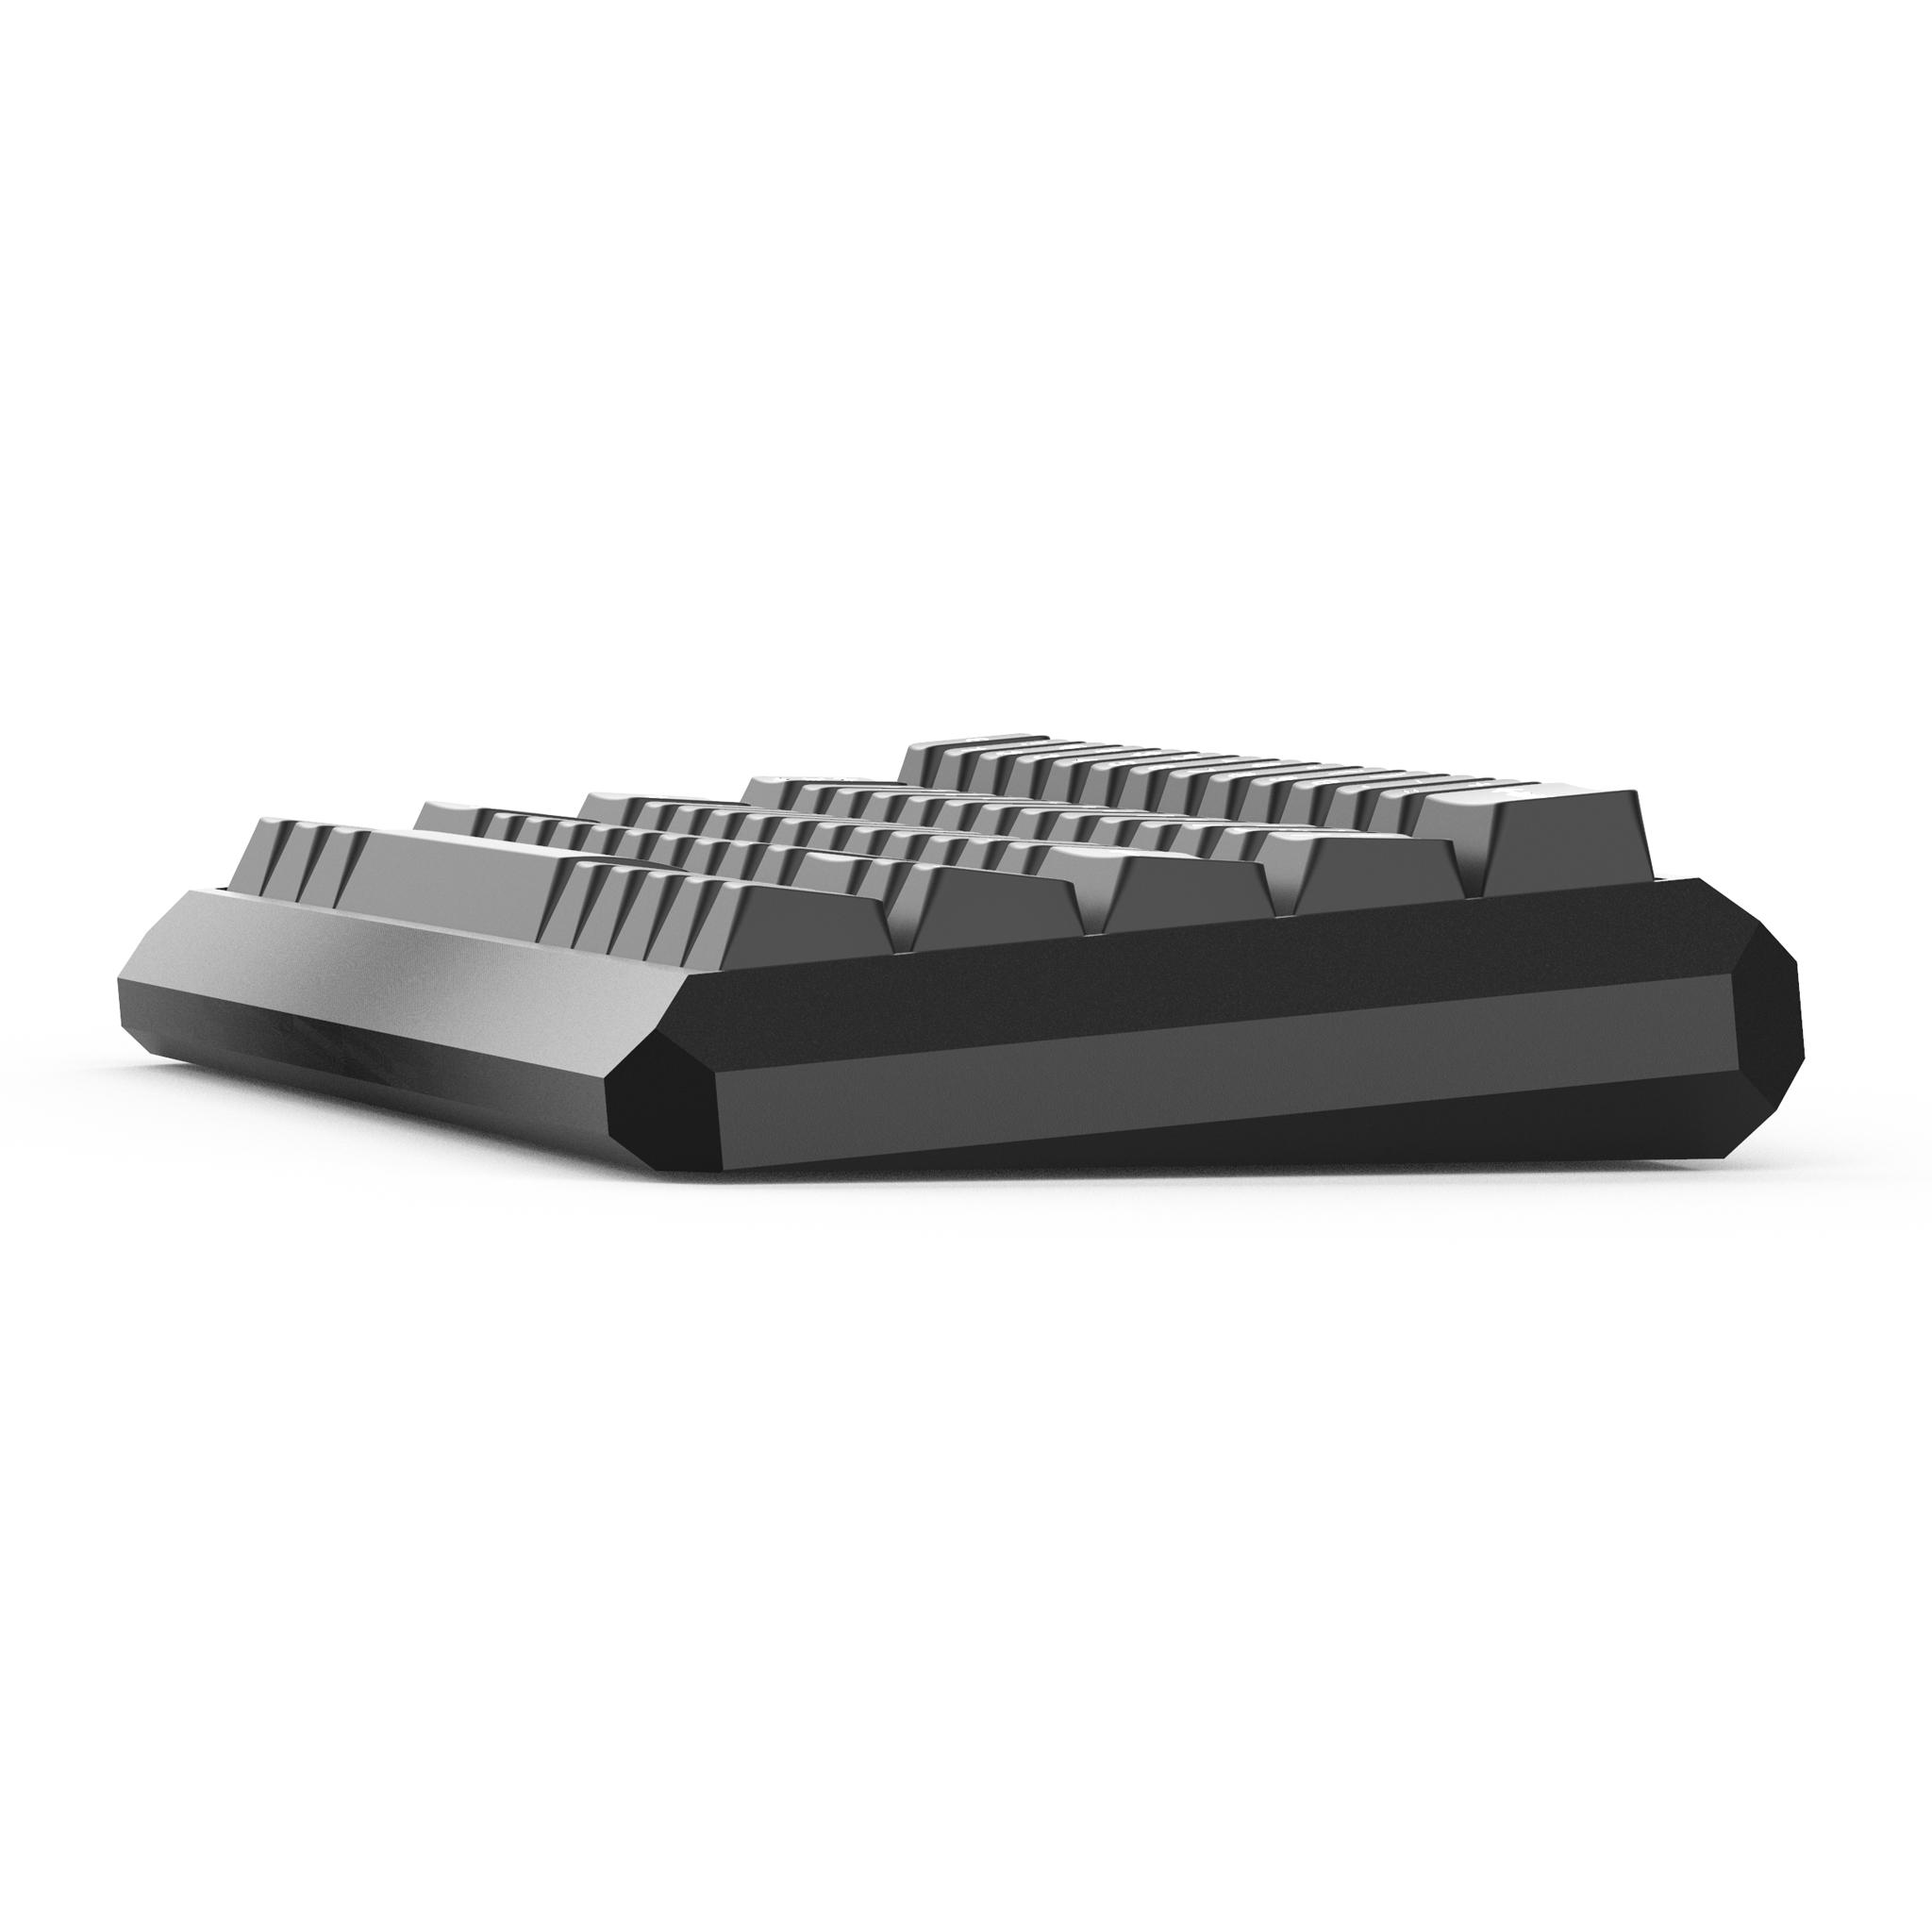 KBDfans客制化机械键盘外壳5度60%阳极氧化CNC铝gh60五度金属底座